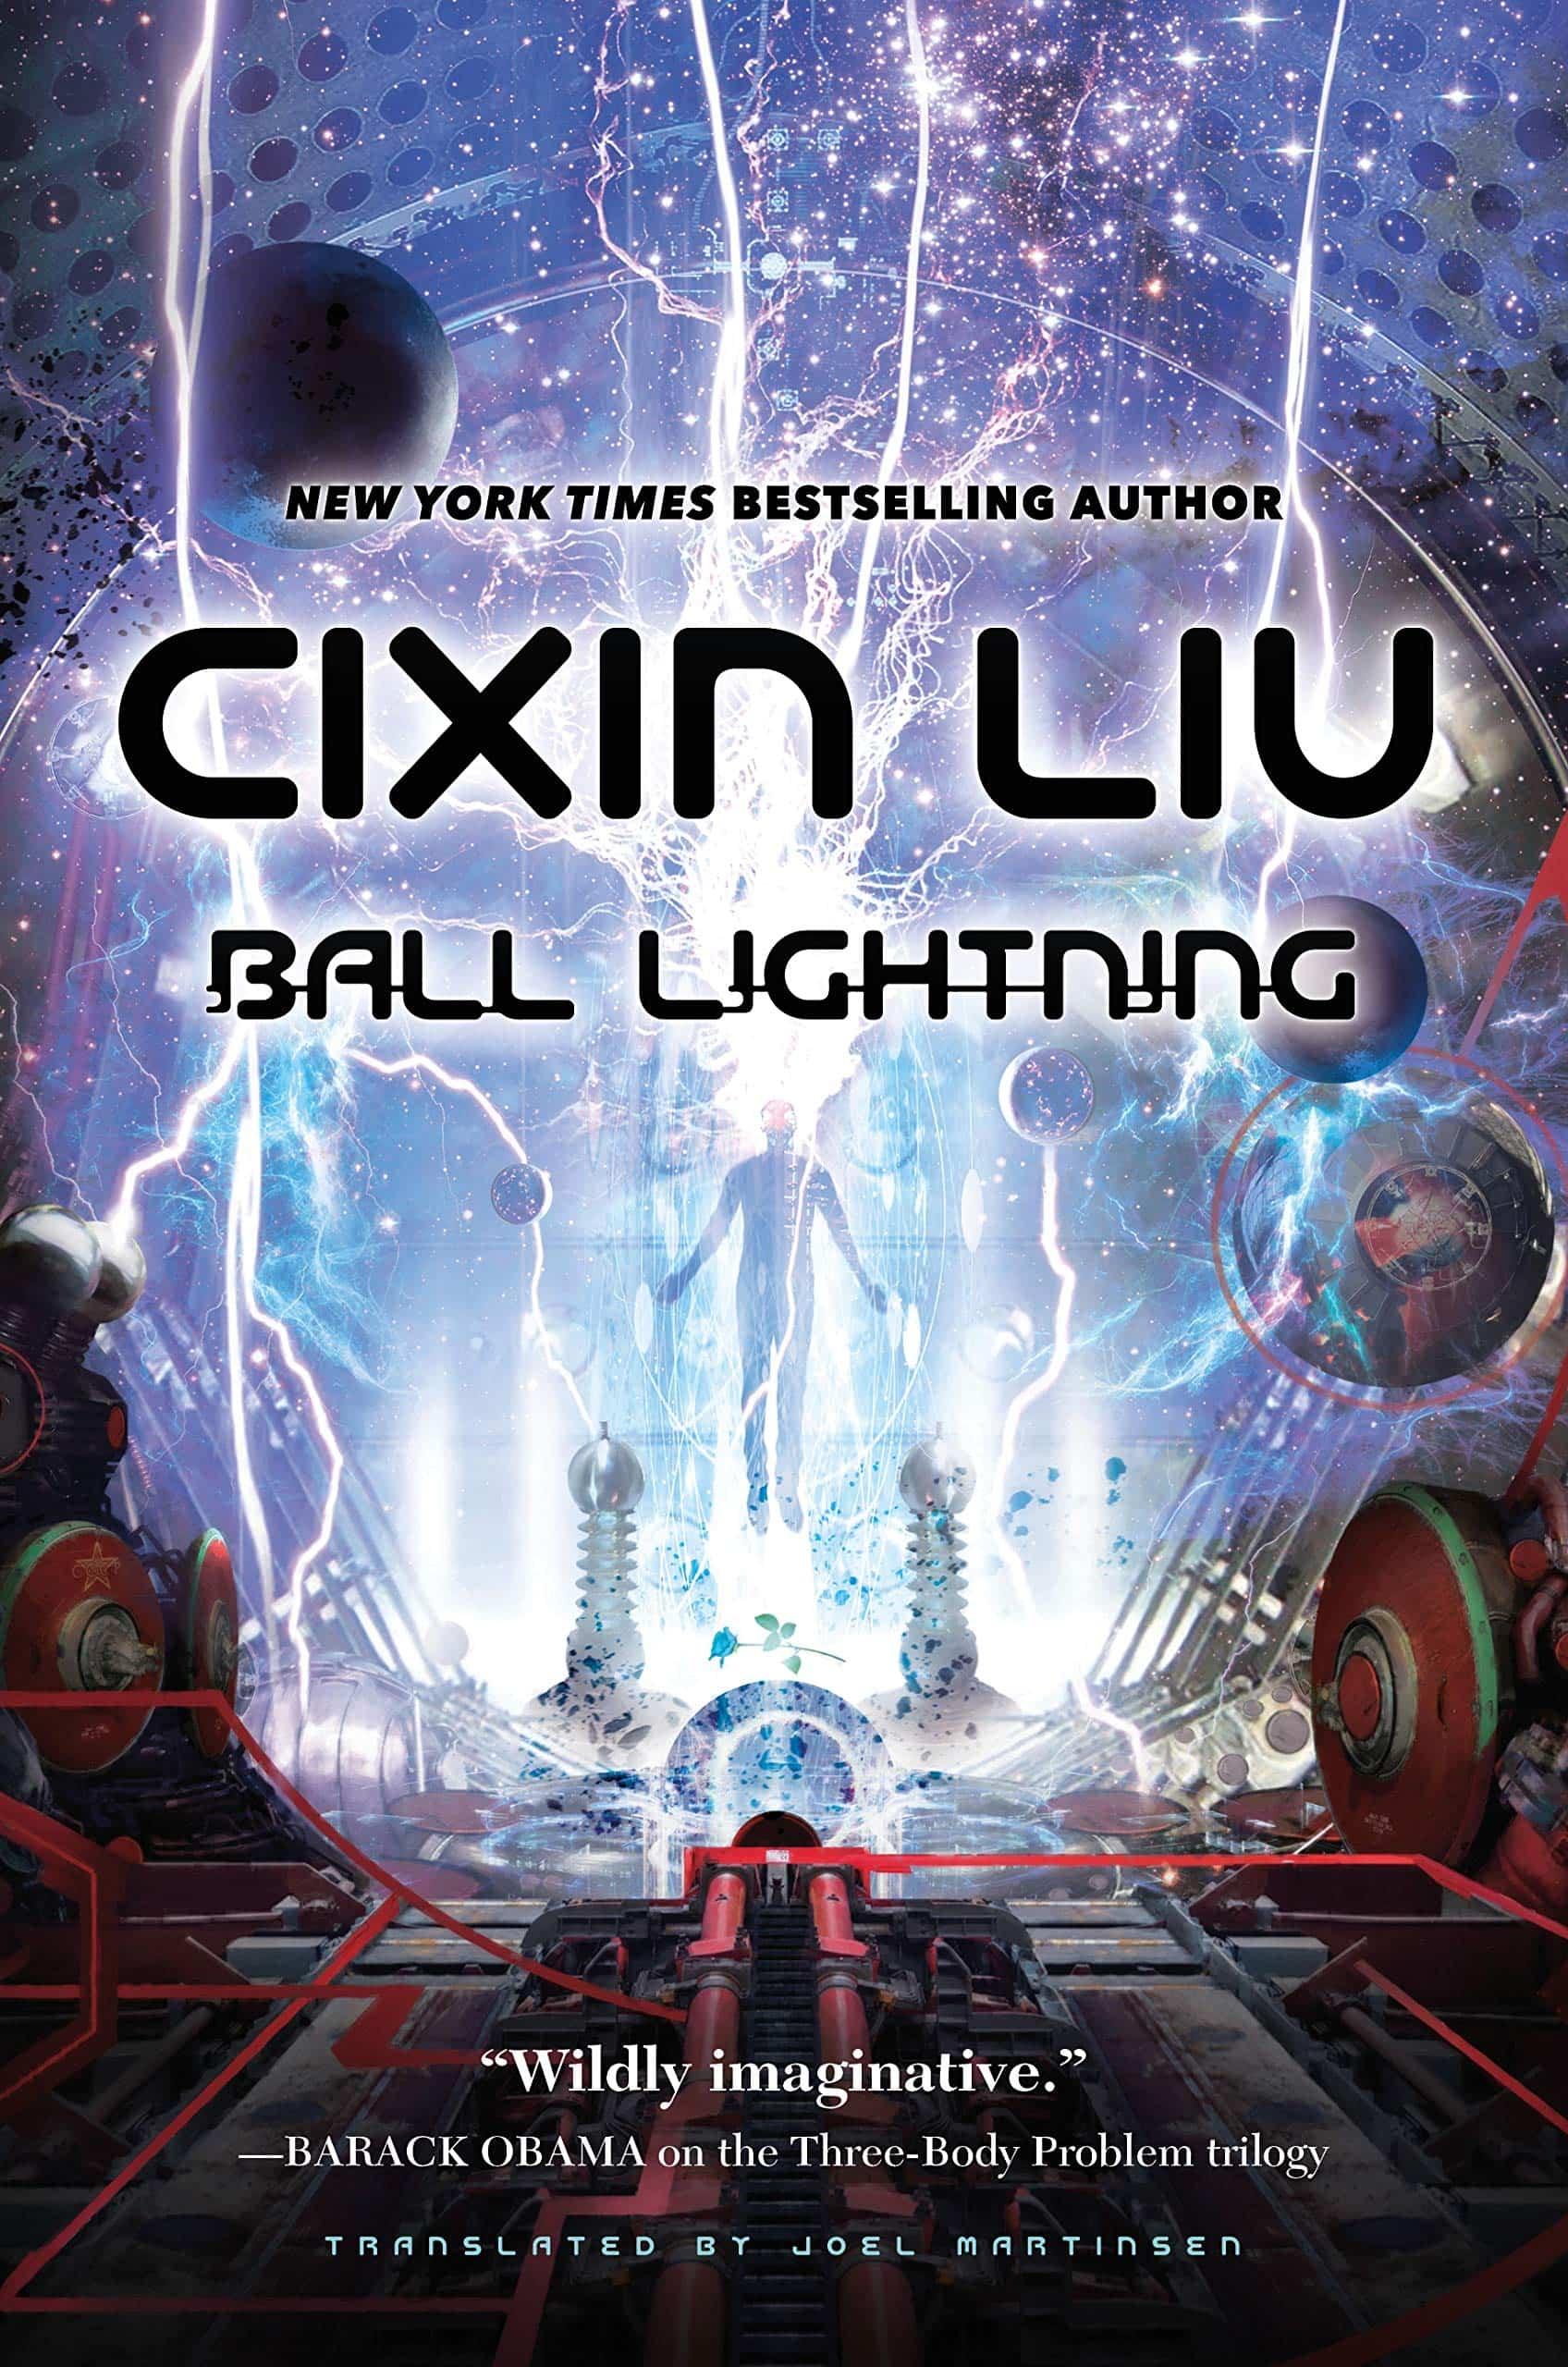 The cover of Ball Lightning